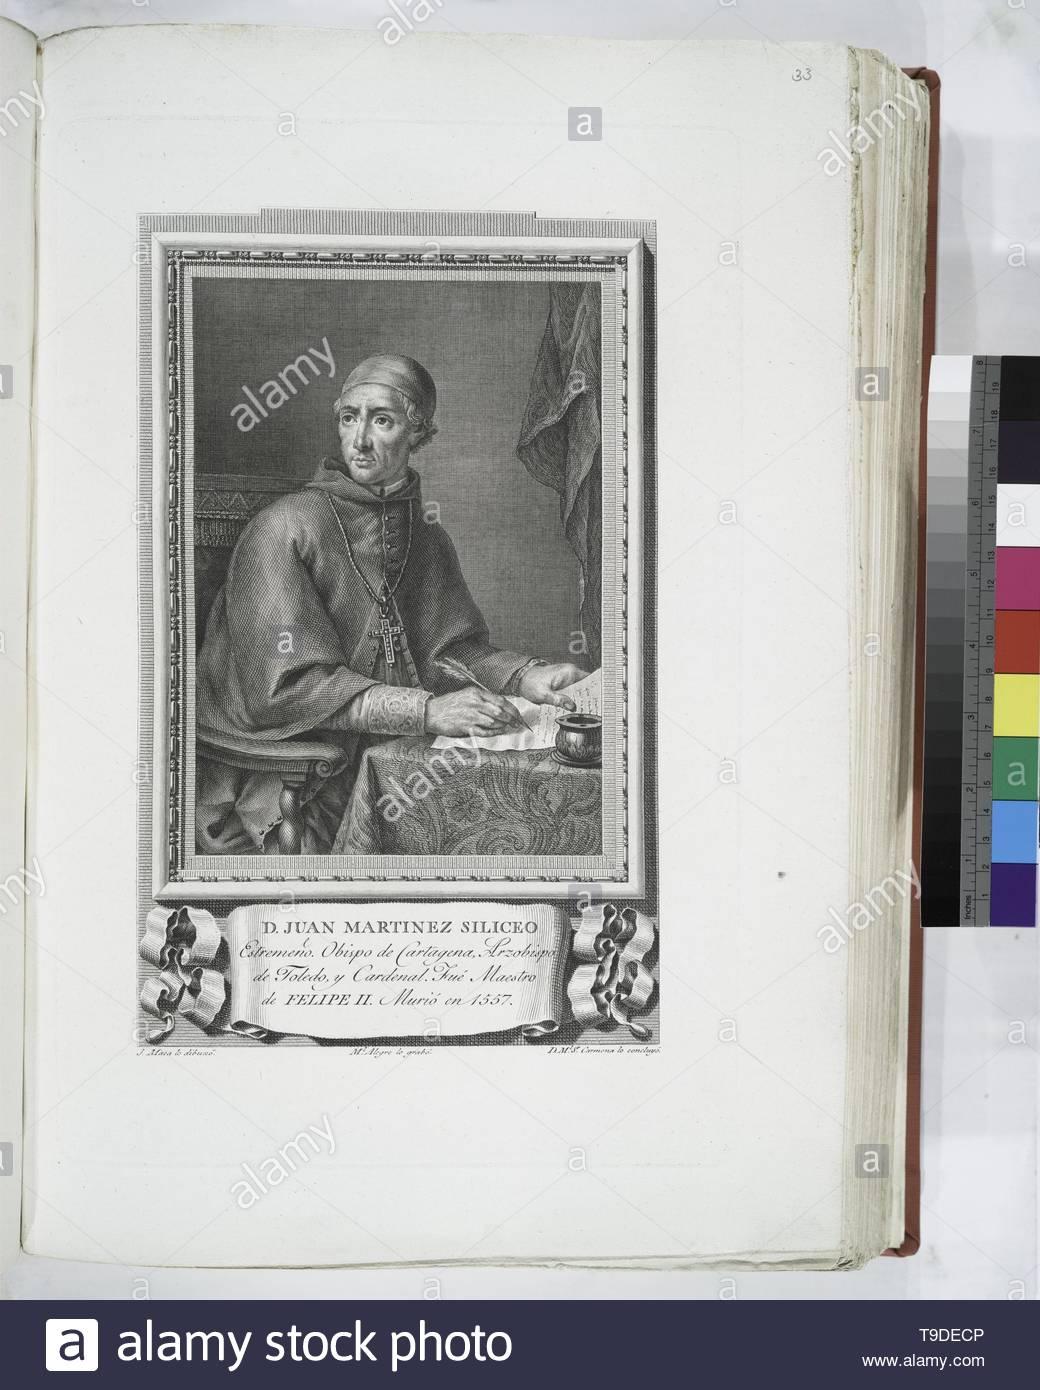 Maea,José(1759-1826)-D  Juan Martinez Siliceo - Stock Image